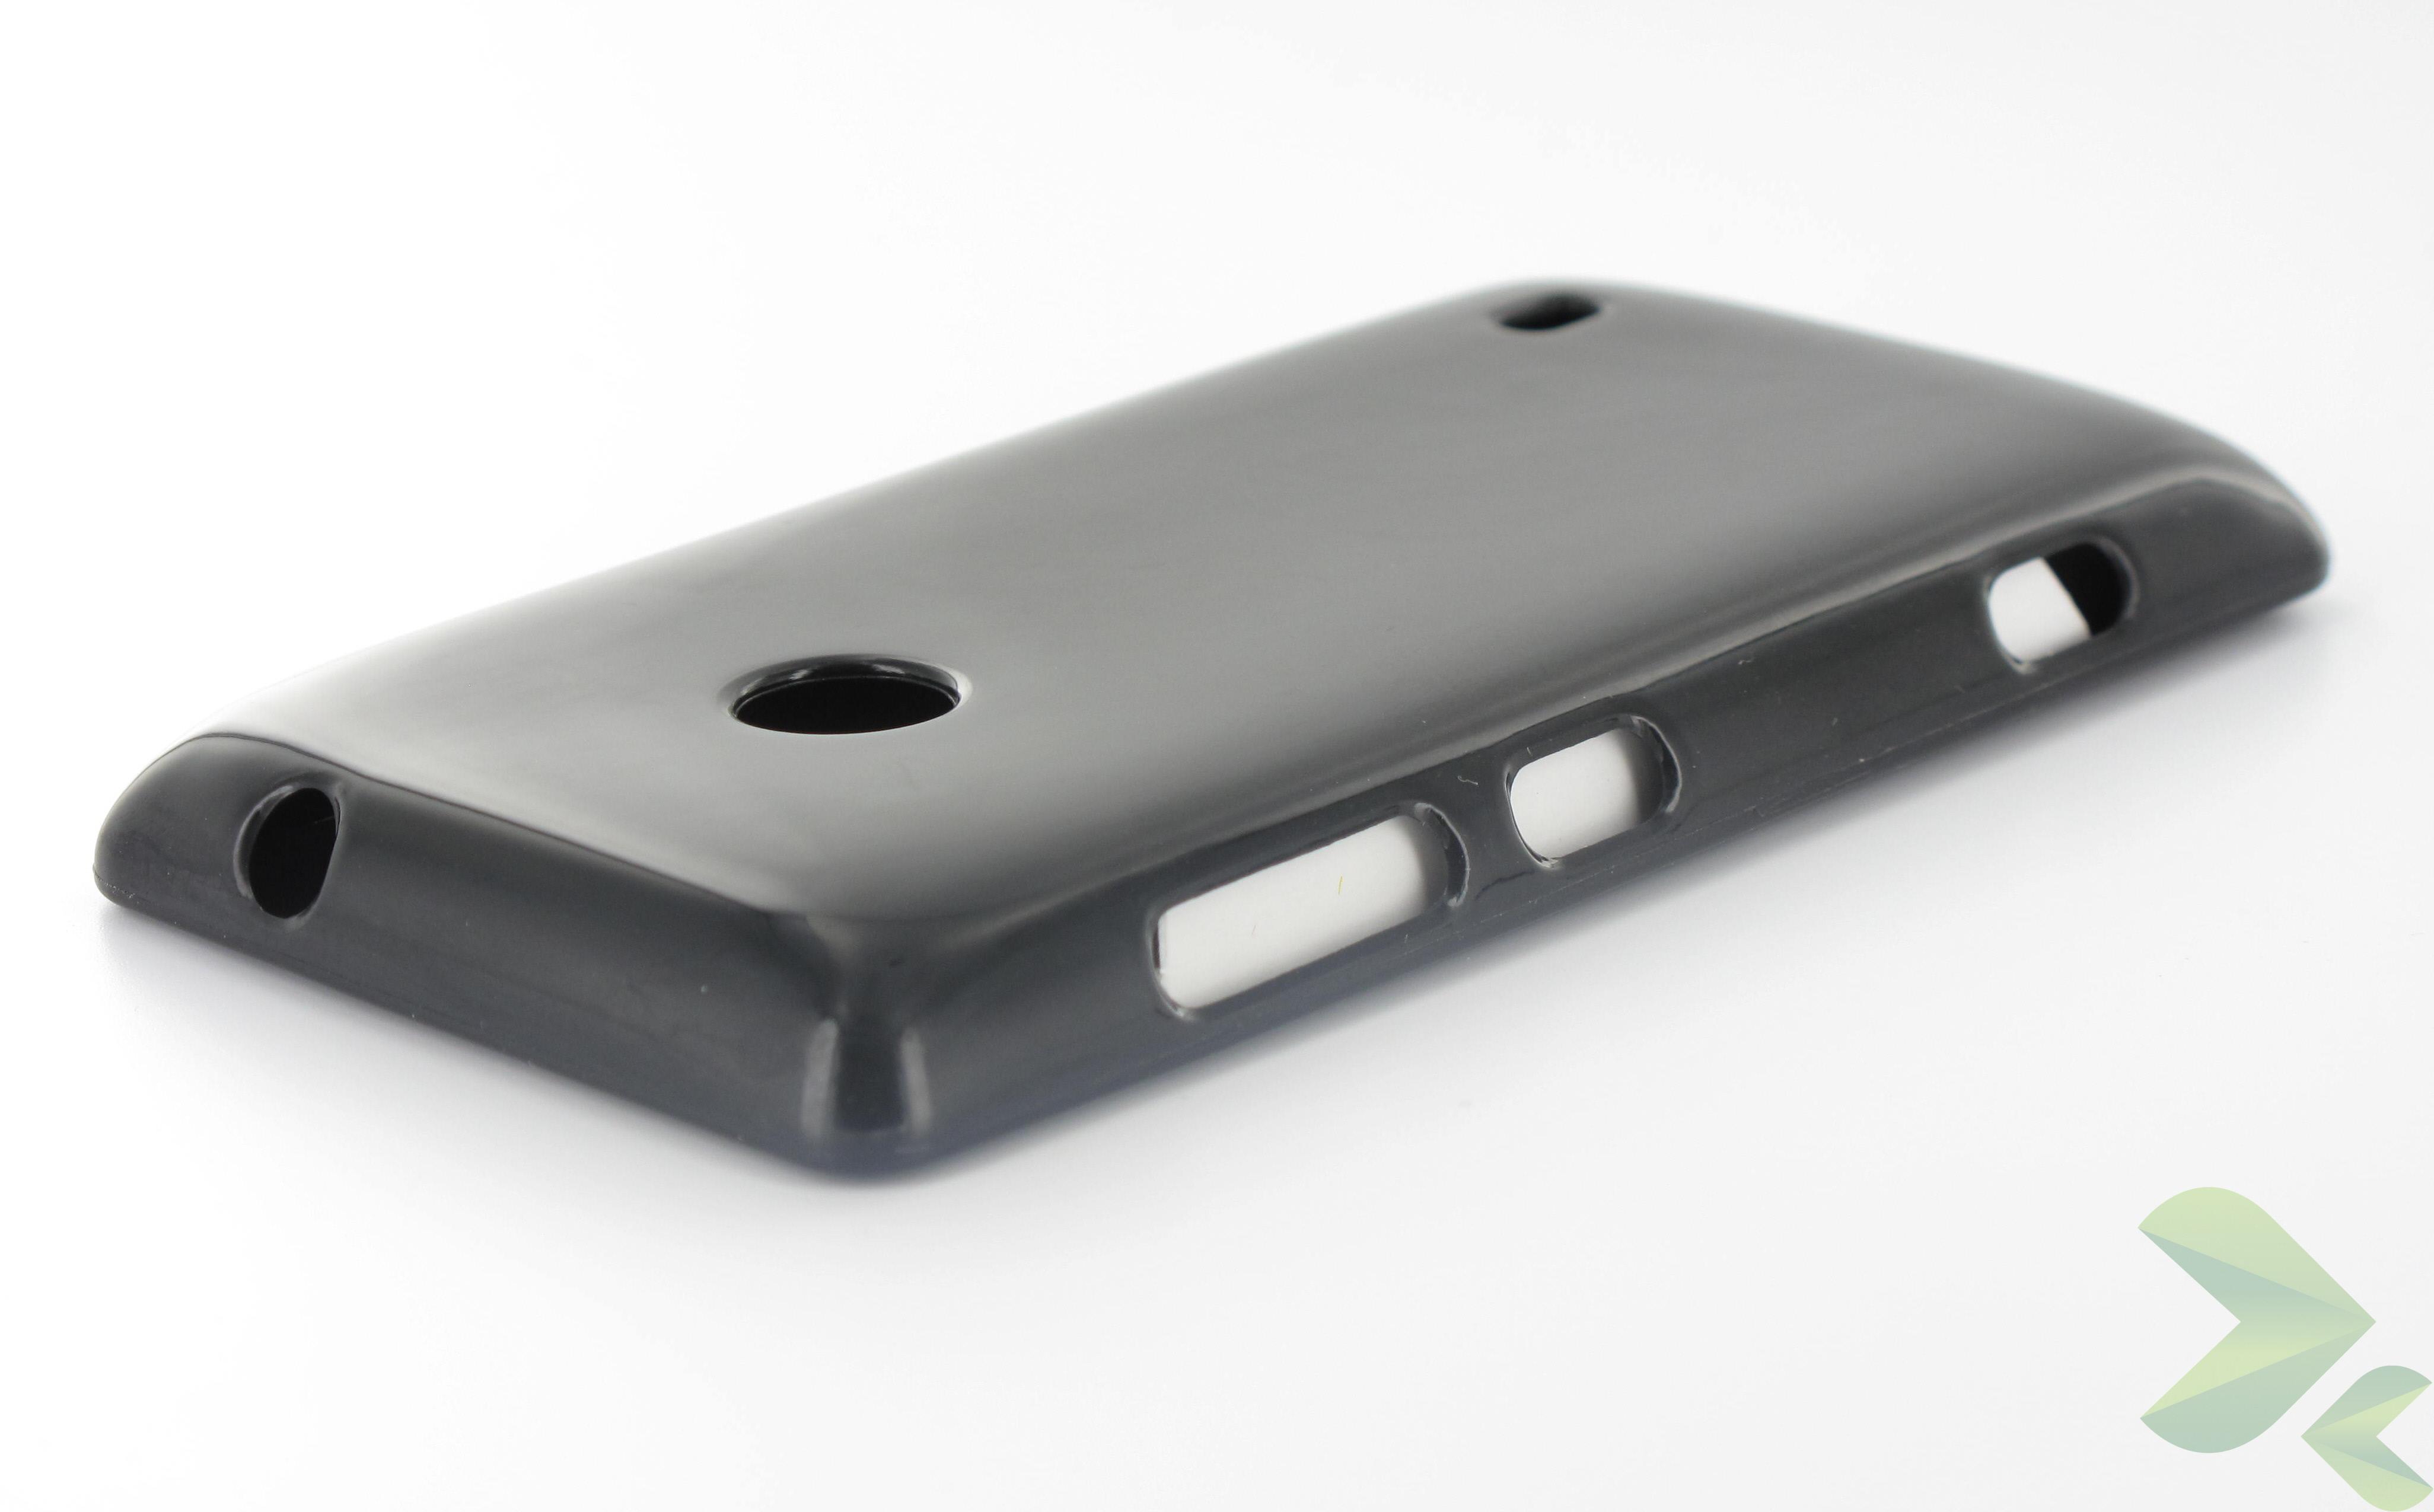 Geffy - Etui Nokia Lumia 520 TPU solid color black